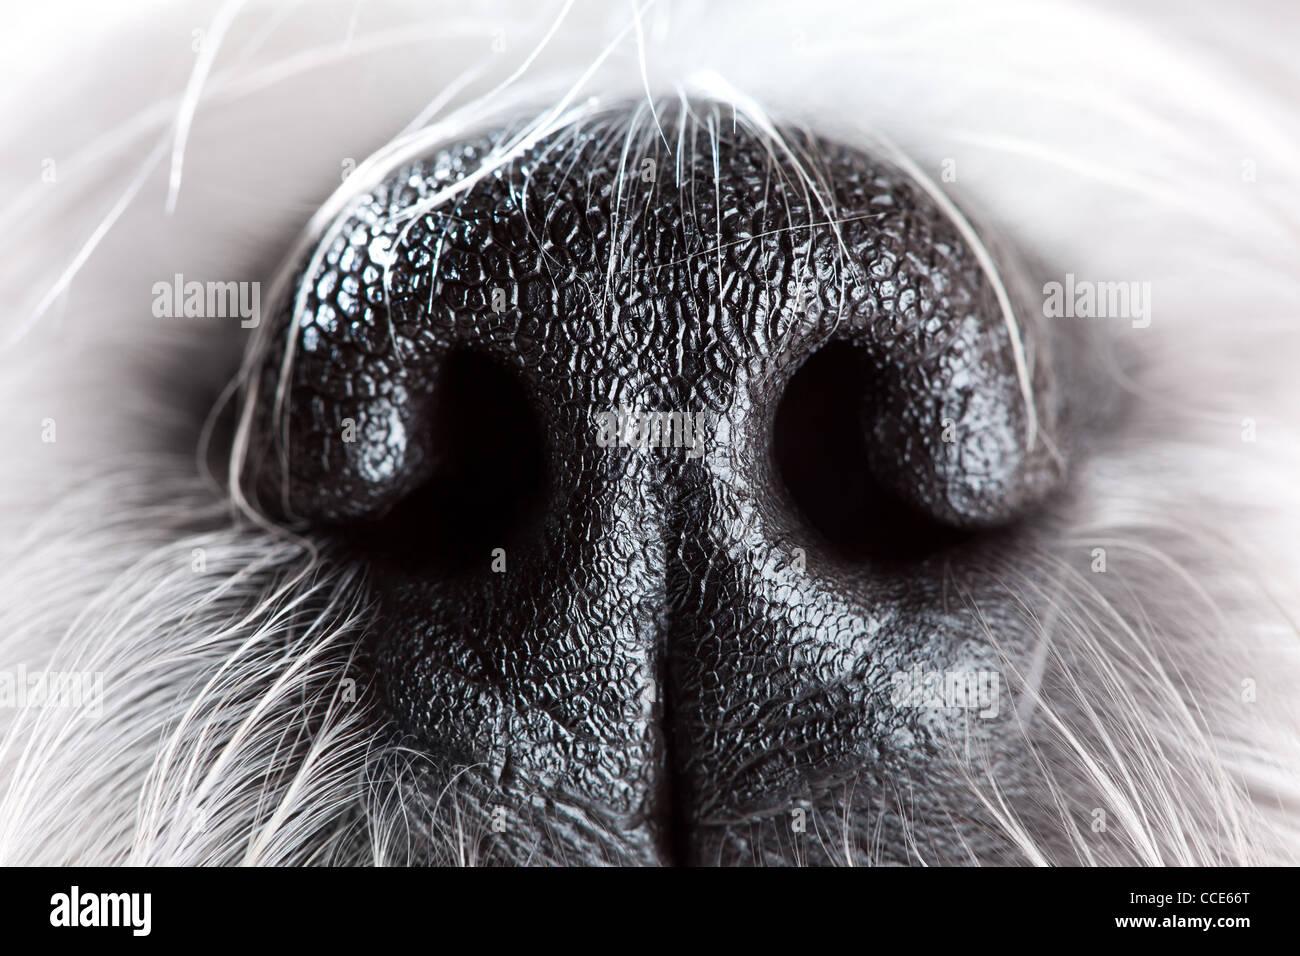 Shih tzu dog nose close-up. - Stock Image